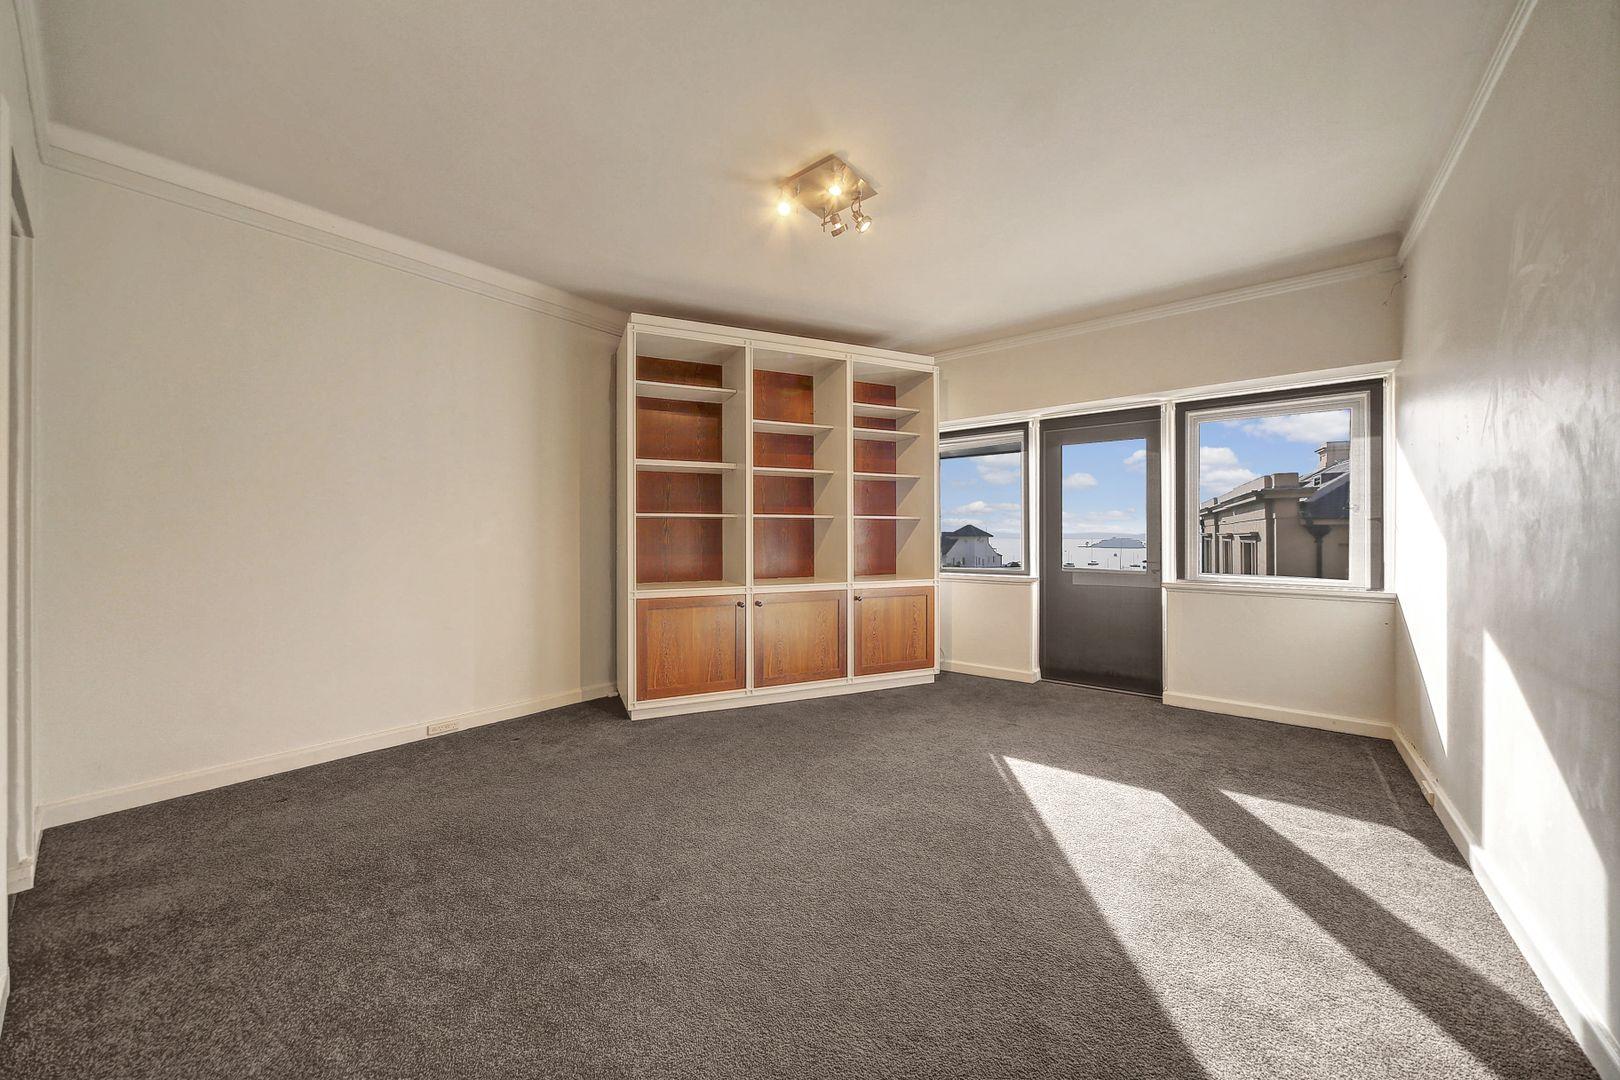 4/36B Macleay Street, Potts Point NSW 2011, Image 1